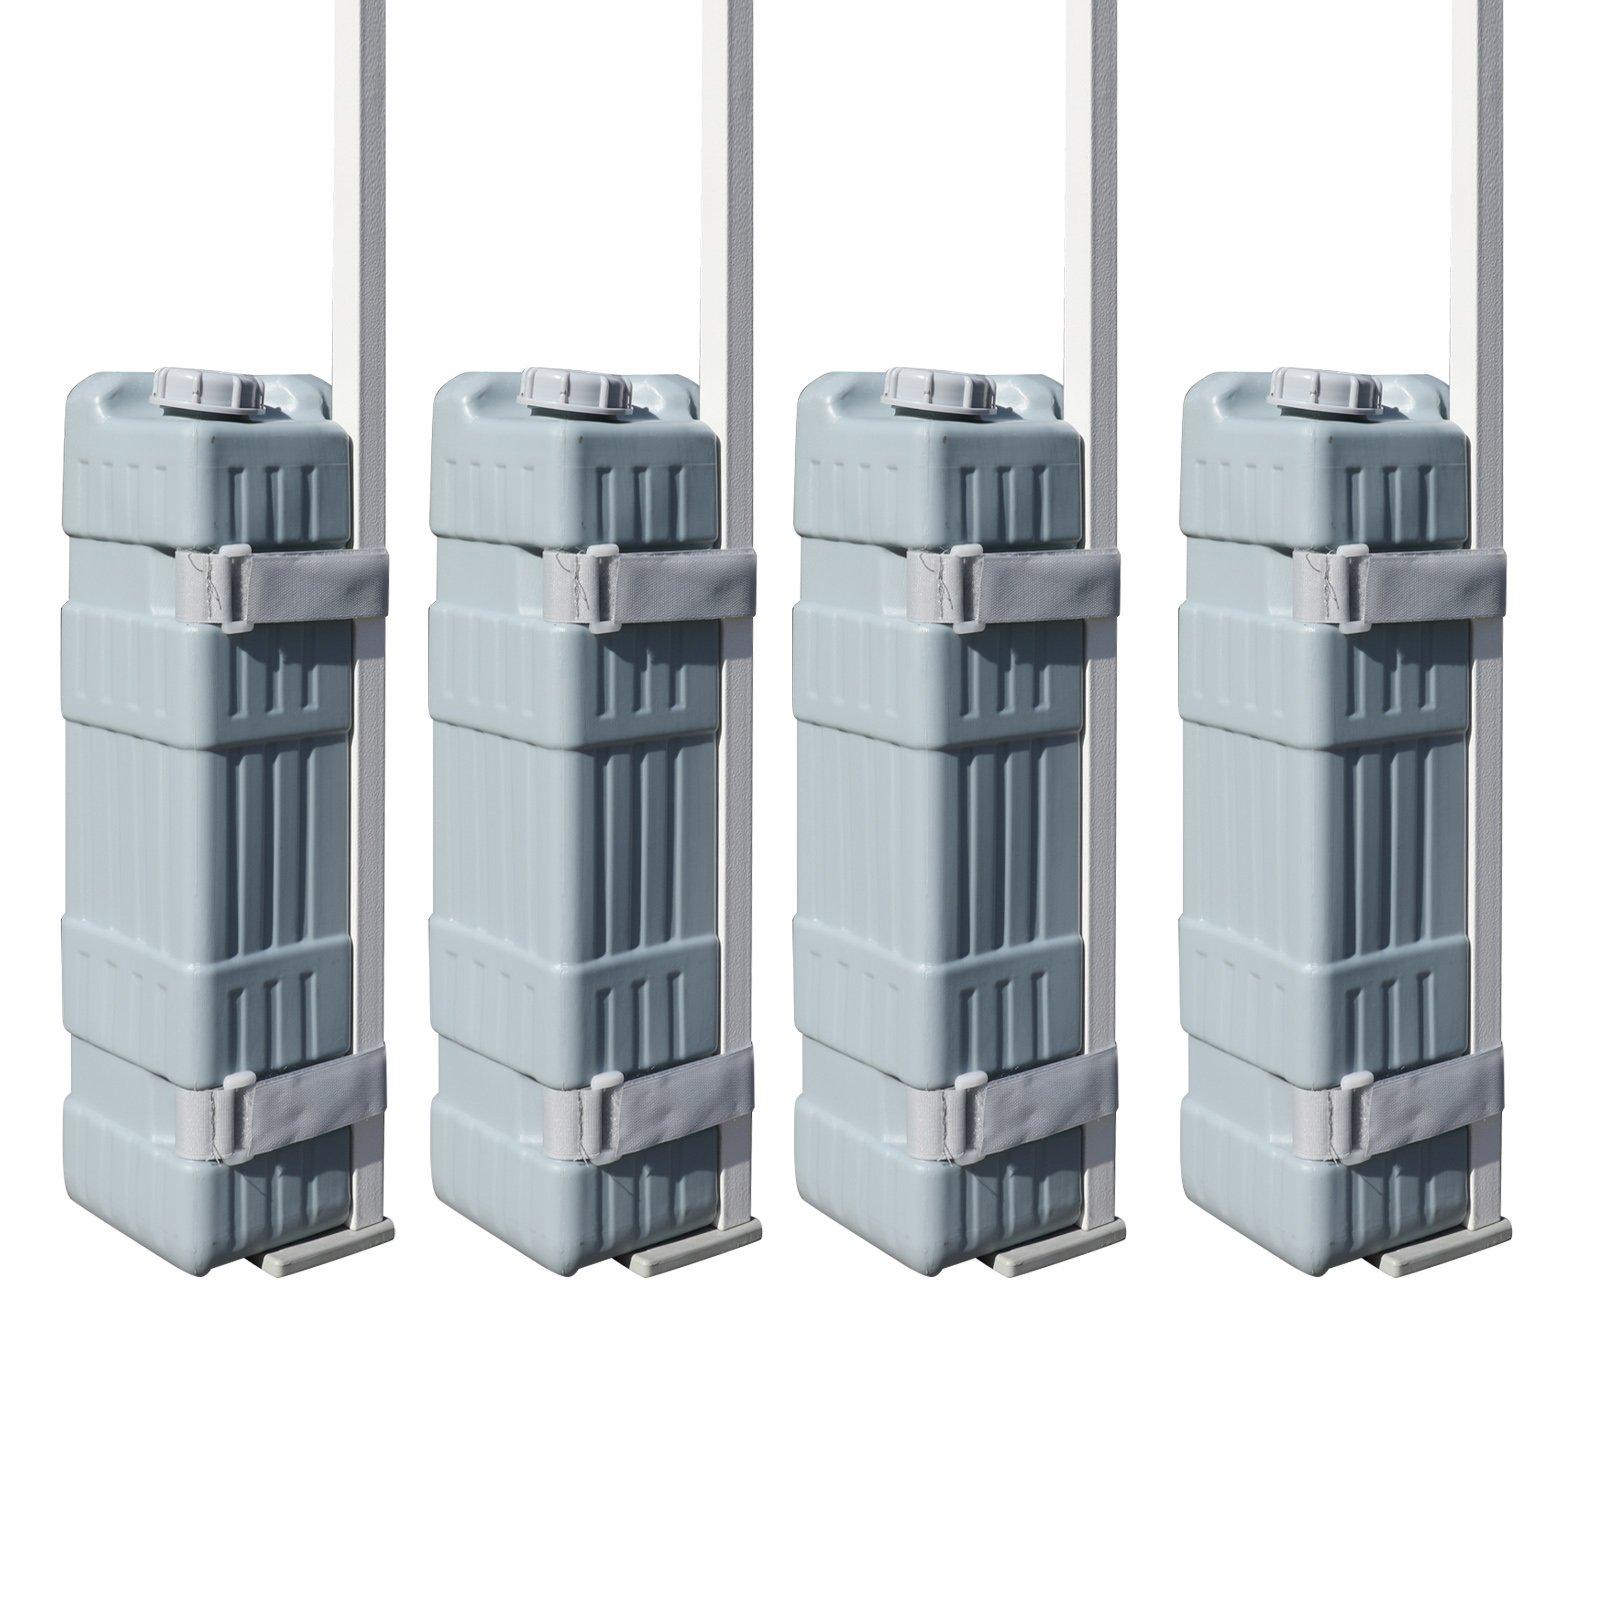 Eurmax Universal Canopy Water Weight Feet (Set of 4)